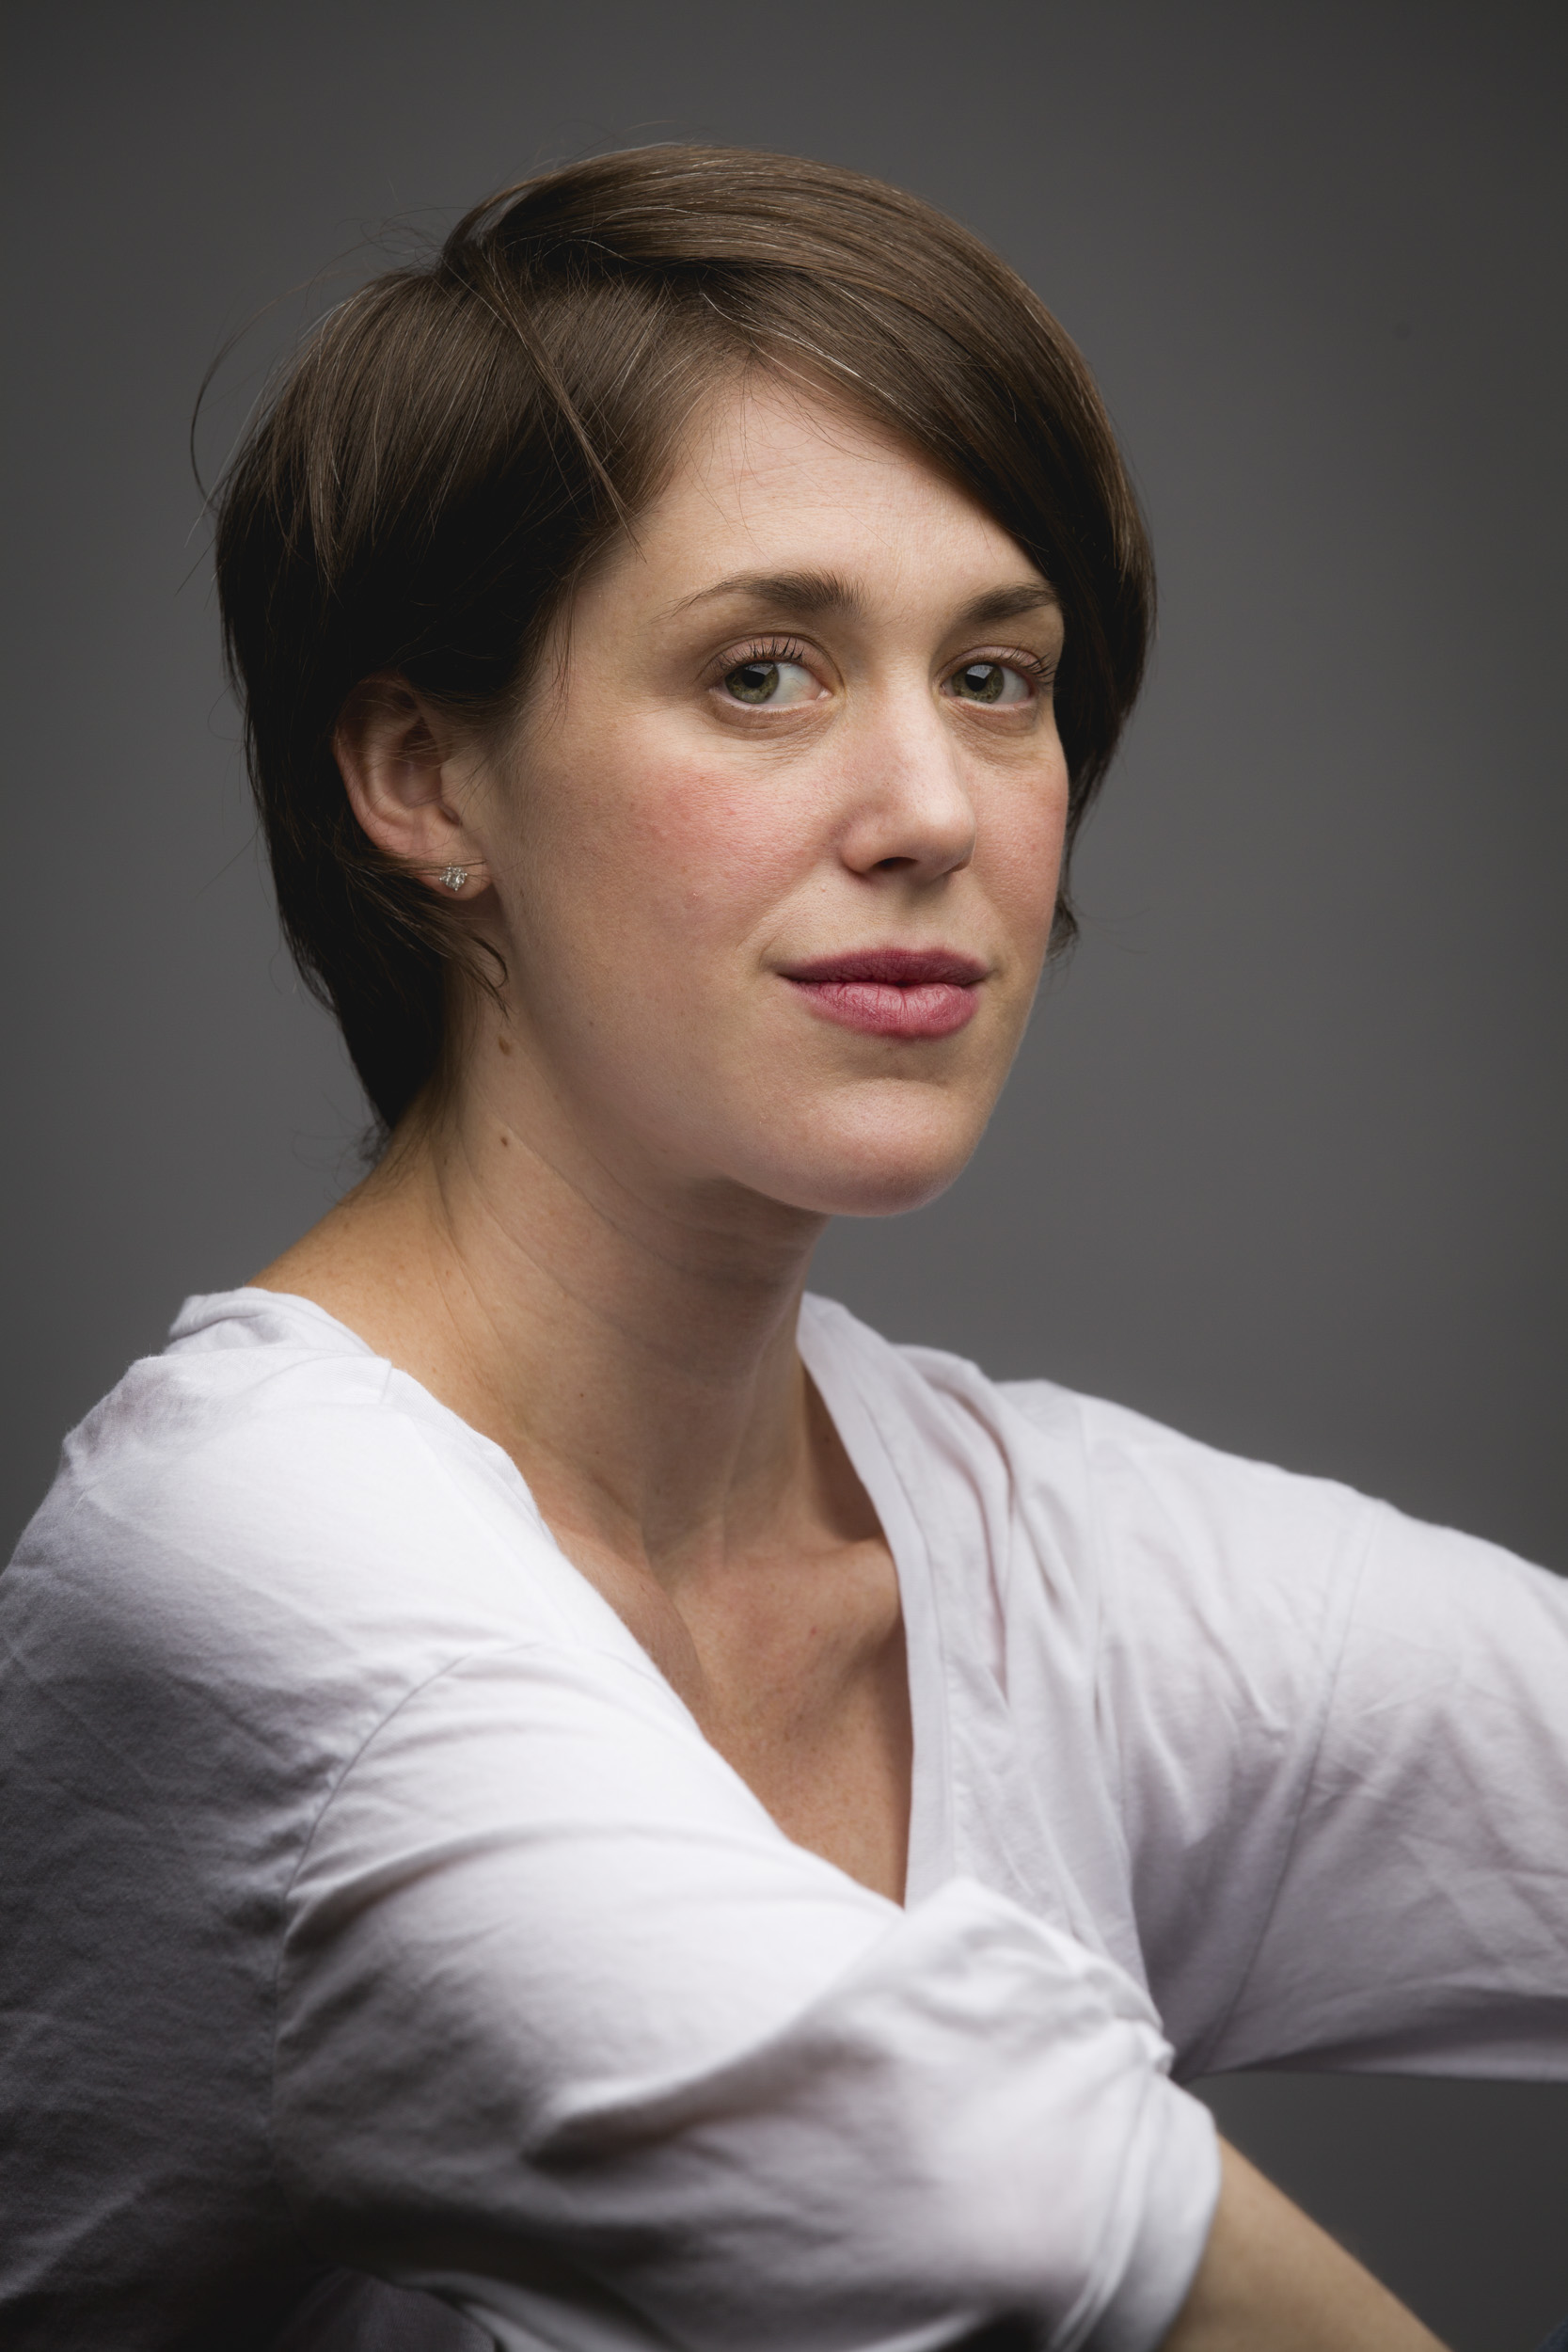 09Henrikson-Rachel Hulin Tether015.JPG